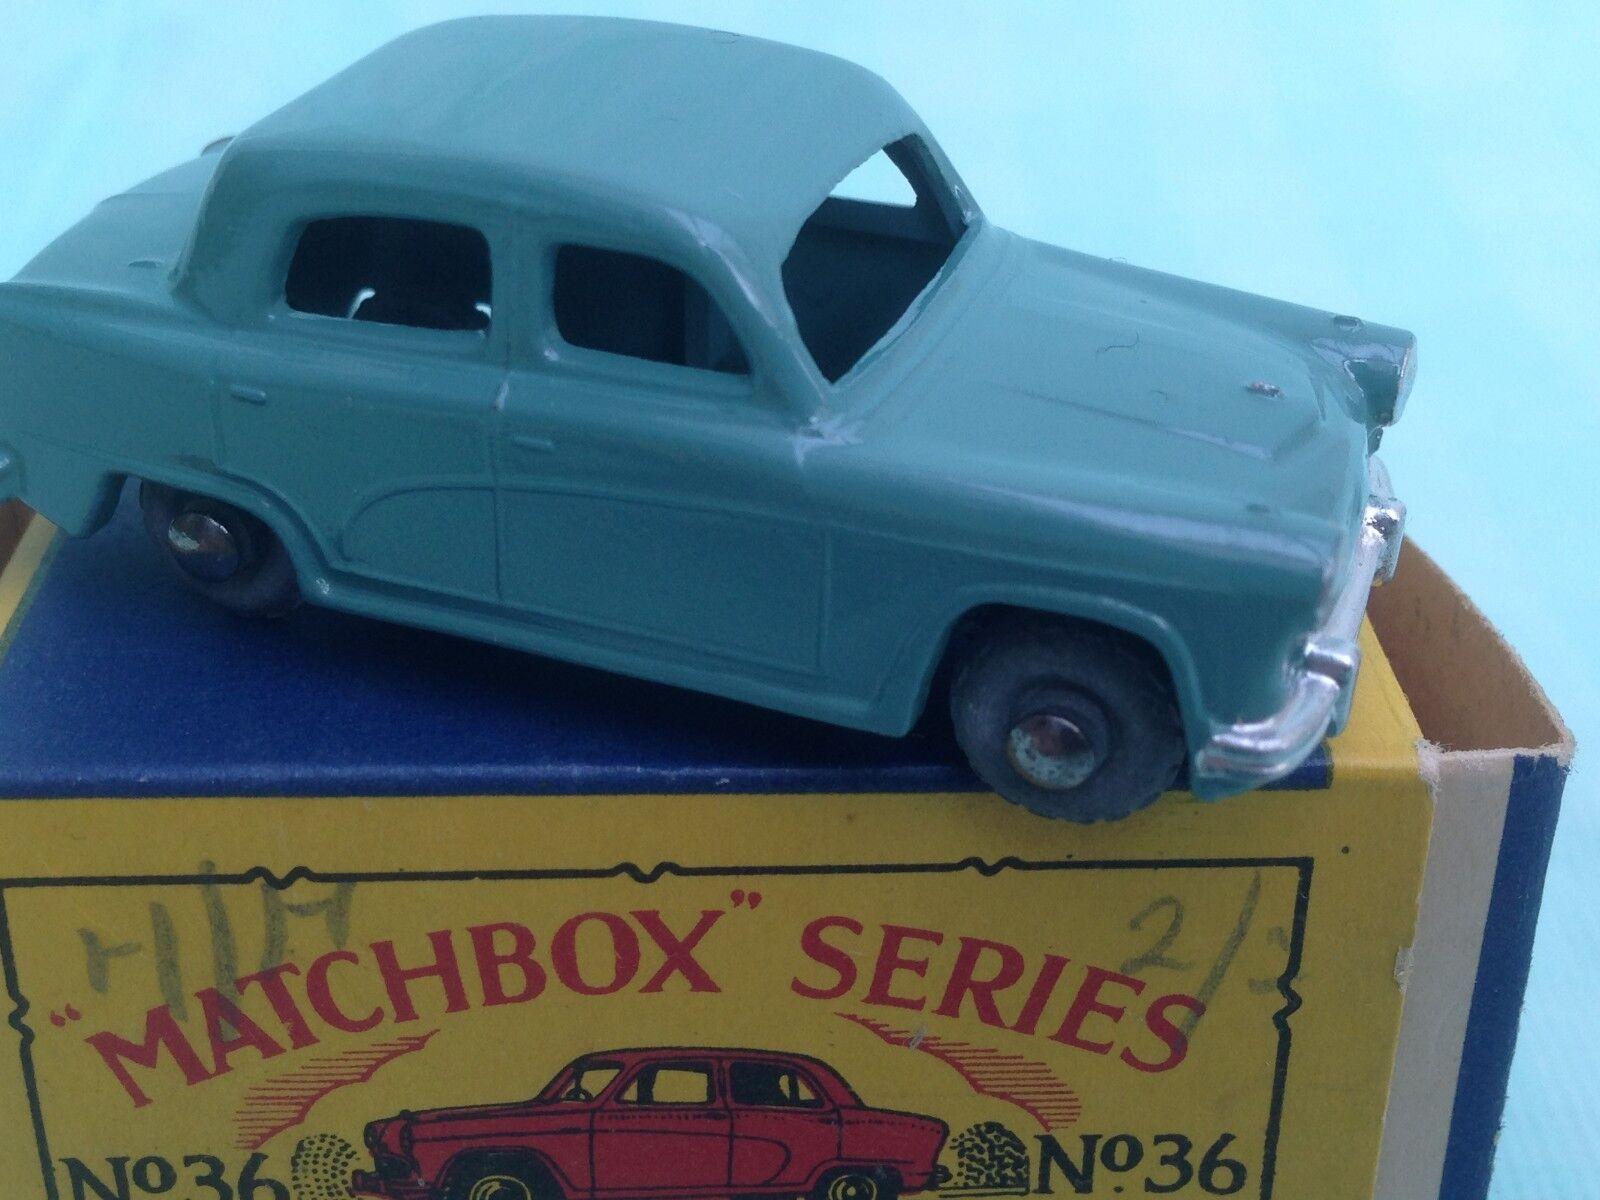 MATCHBOX SERIES Nº 36 A MOKO LESNEY Nº 36 Austin A50